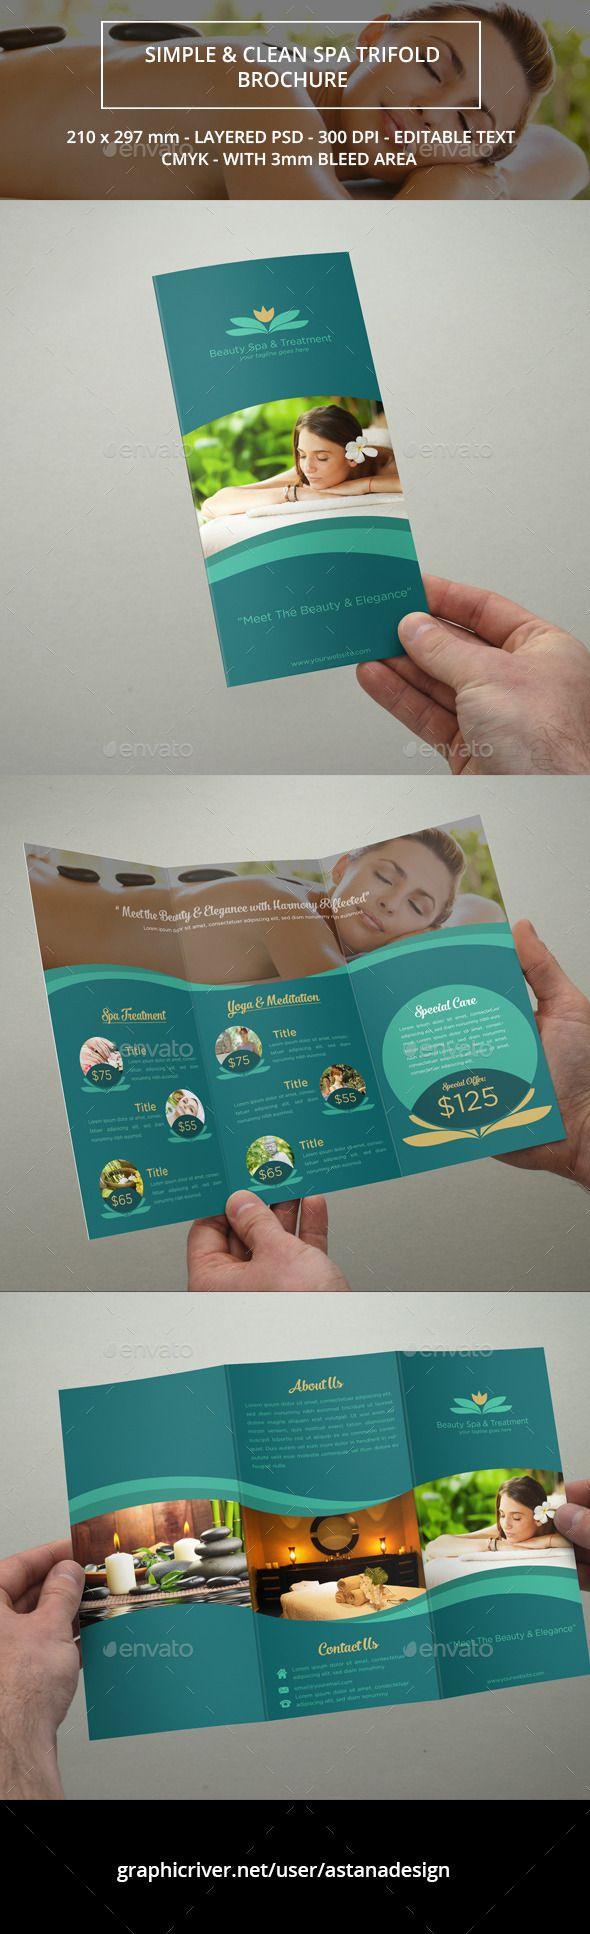 Beauty Spa Trifold Brochure Template #brochure Download: http://graphicriver.net/item/beauty-spa-trifold-brochure/11732800?ref=ksioks